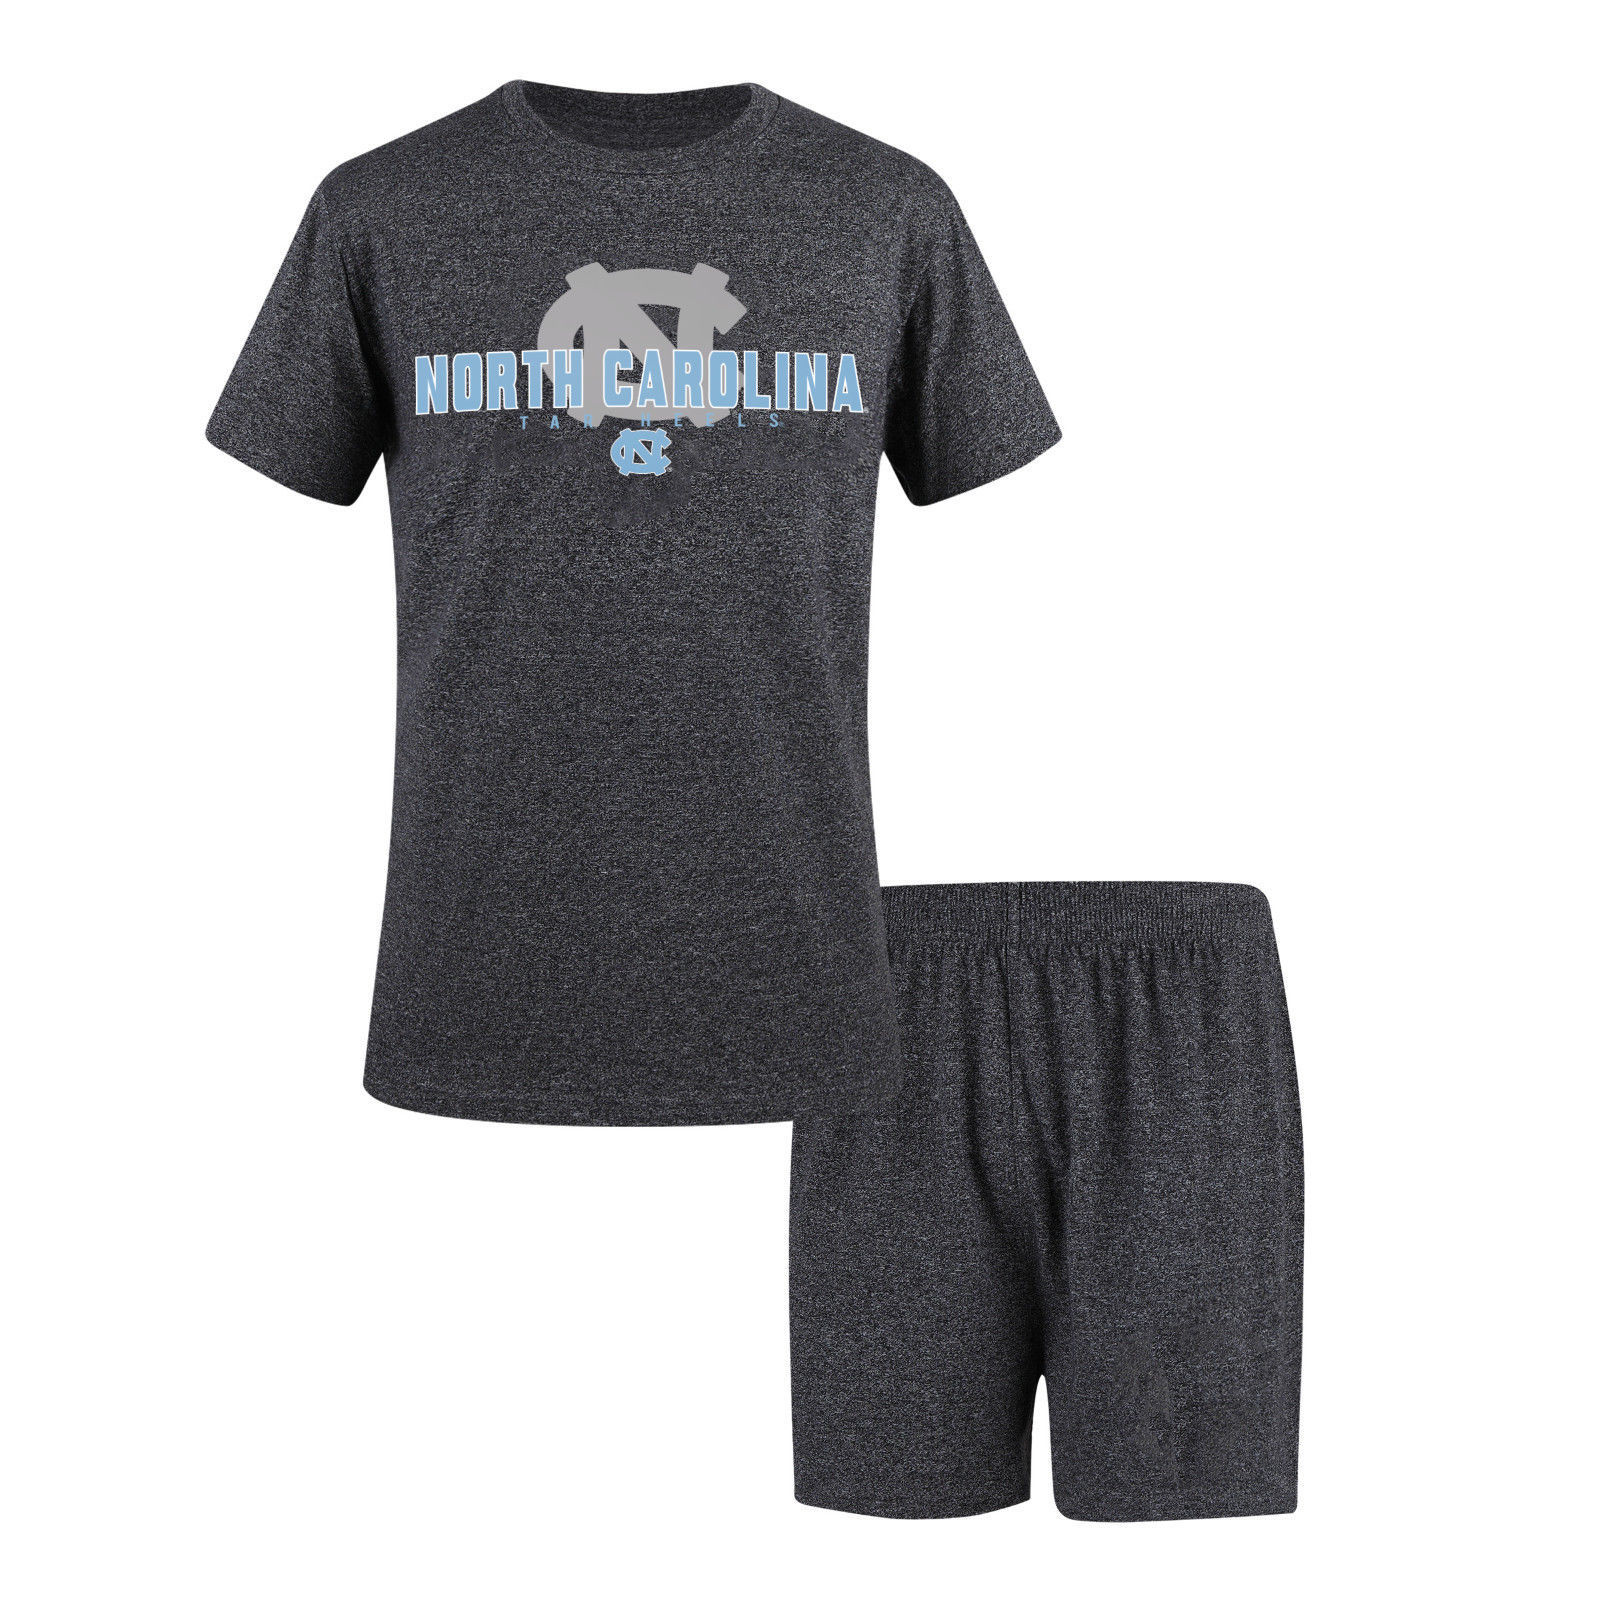 North Carolina Men's Sleepwear Set Shorts Tee Shirt 2-pc Lounge UNC Tar Heels